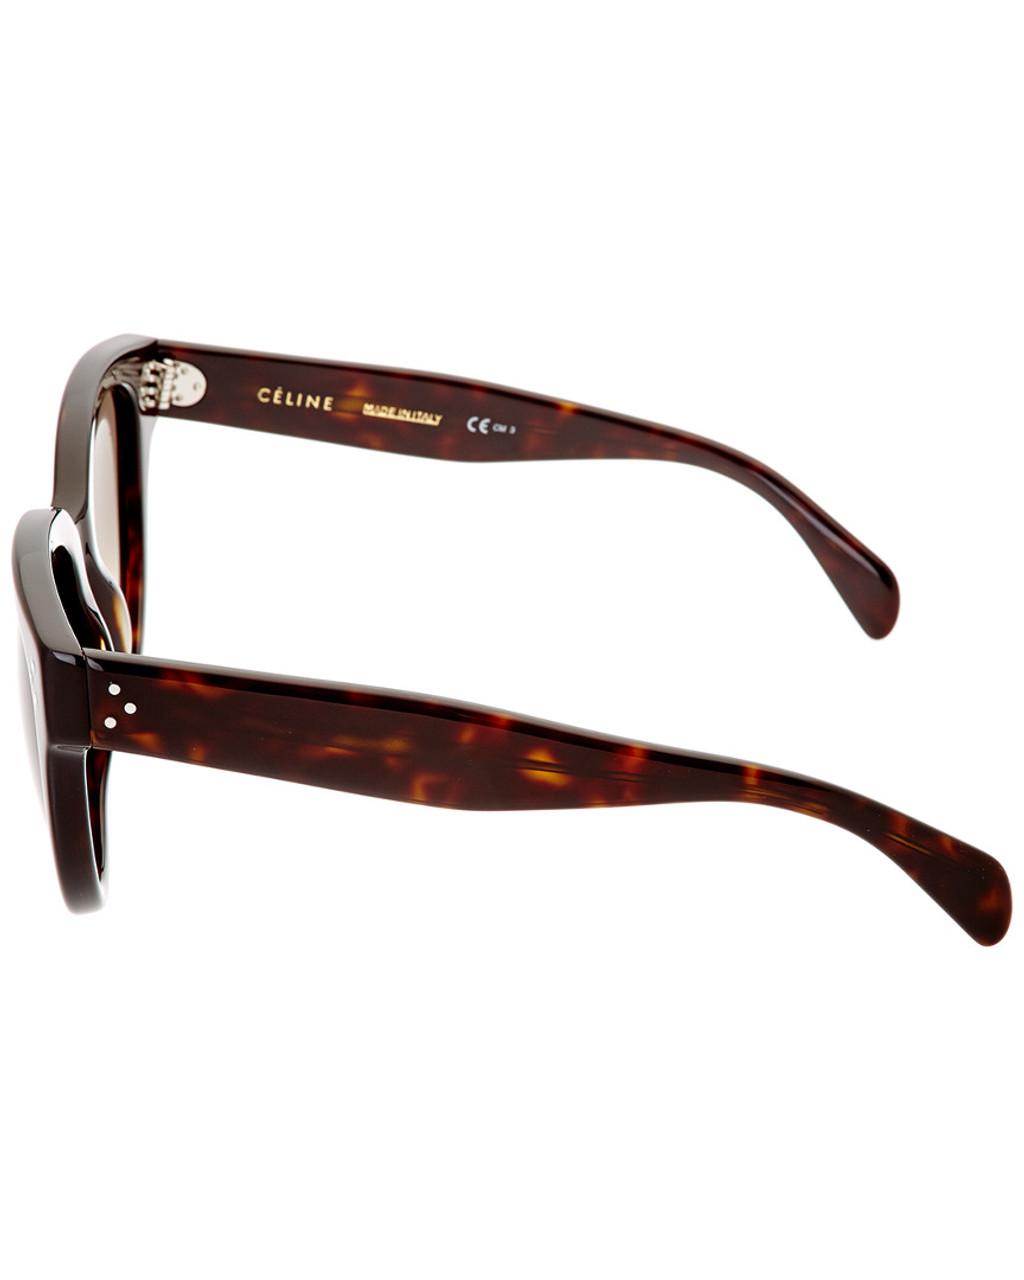 f66fb60aacca0 CELINE Women s Audrey 55mm Sunglasses~1111992403 - Boston Store